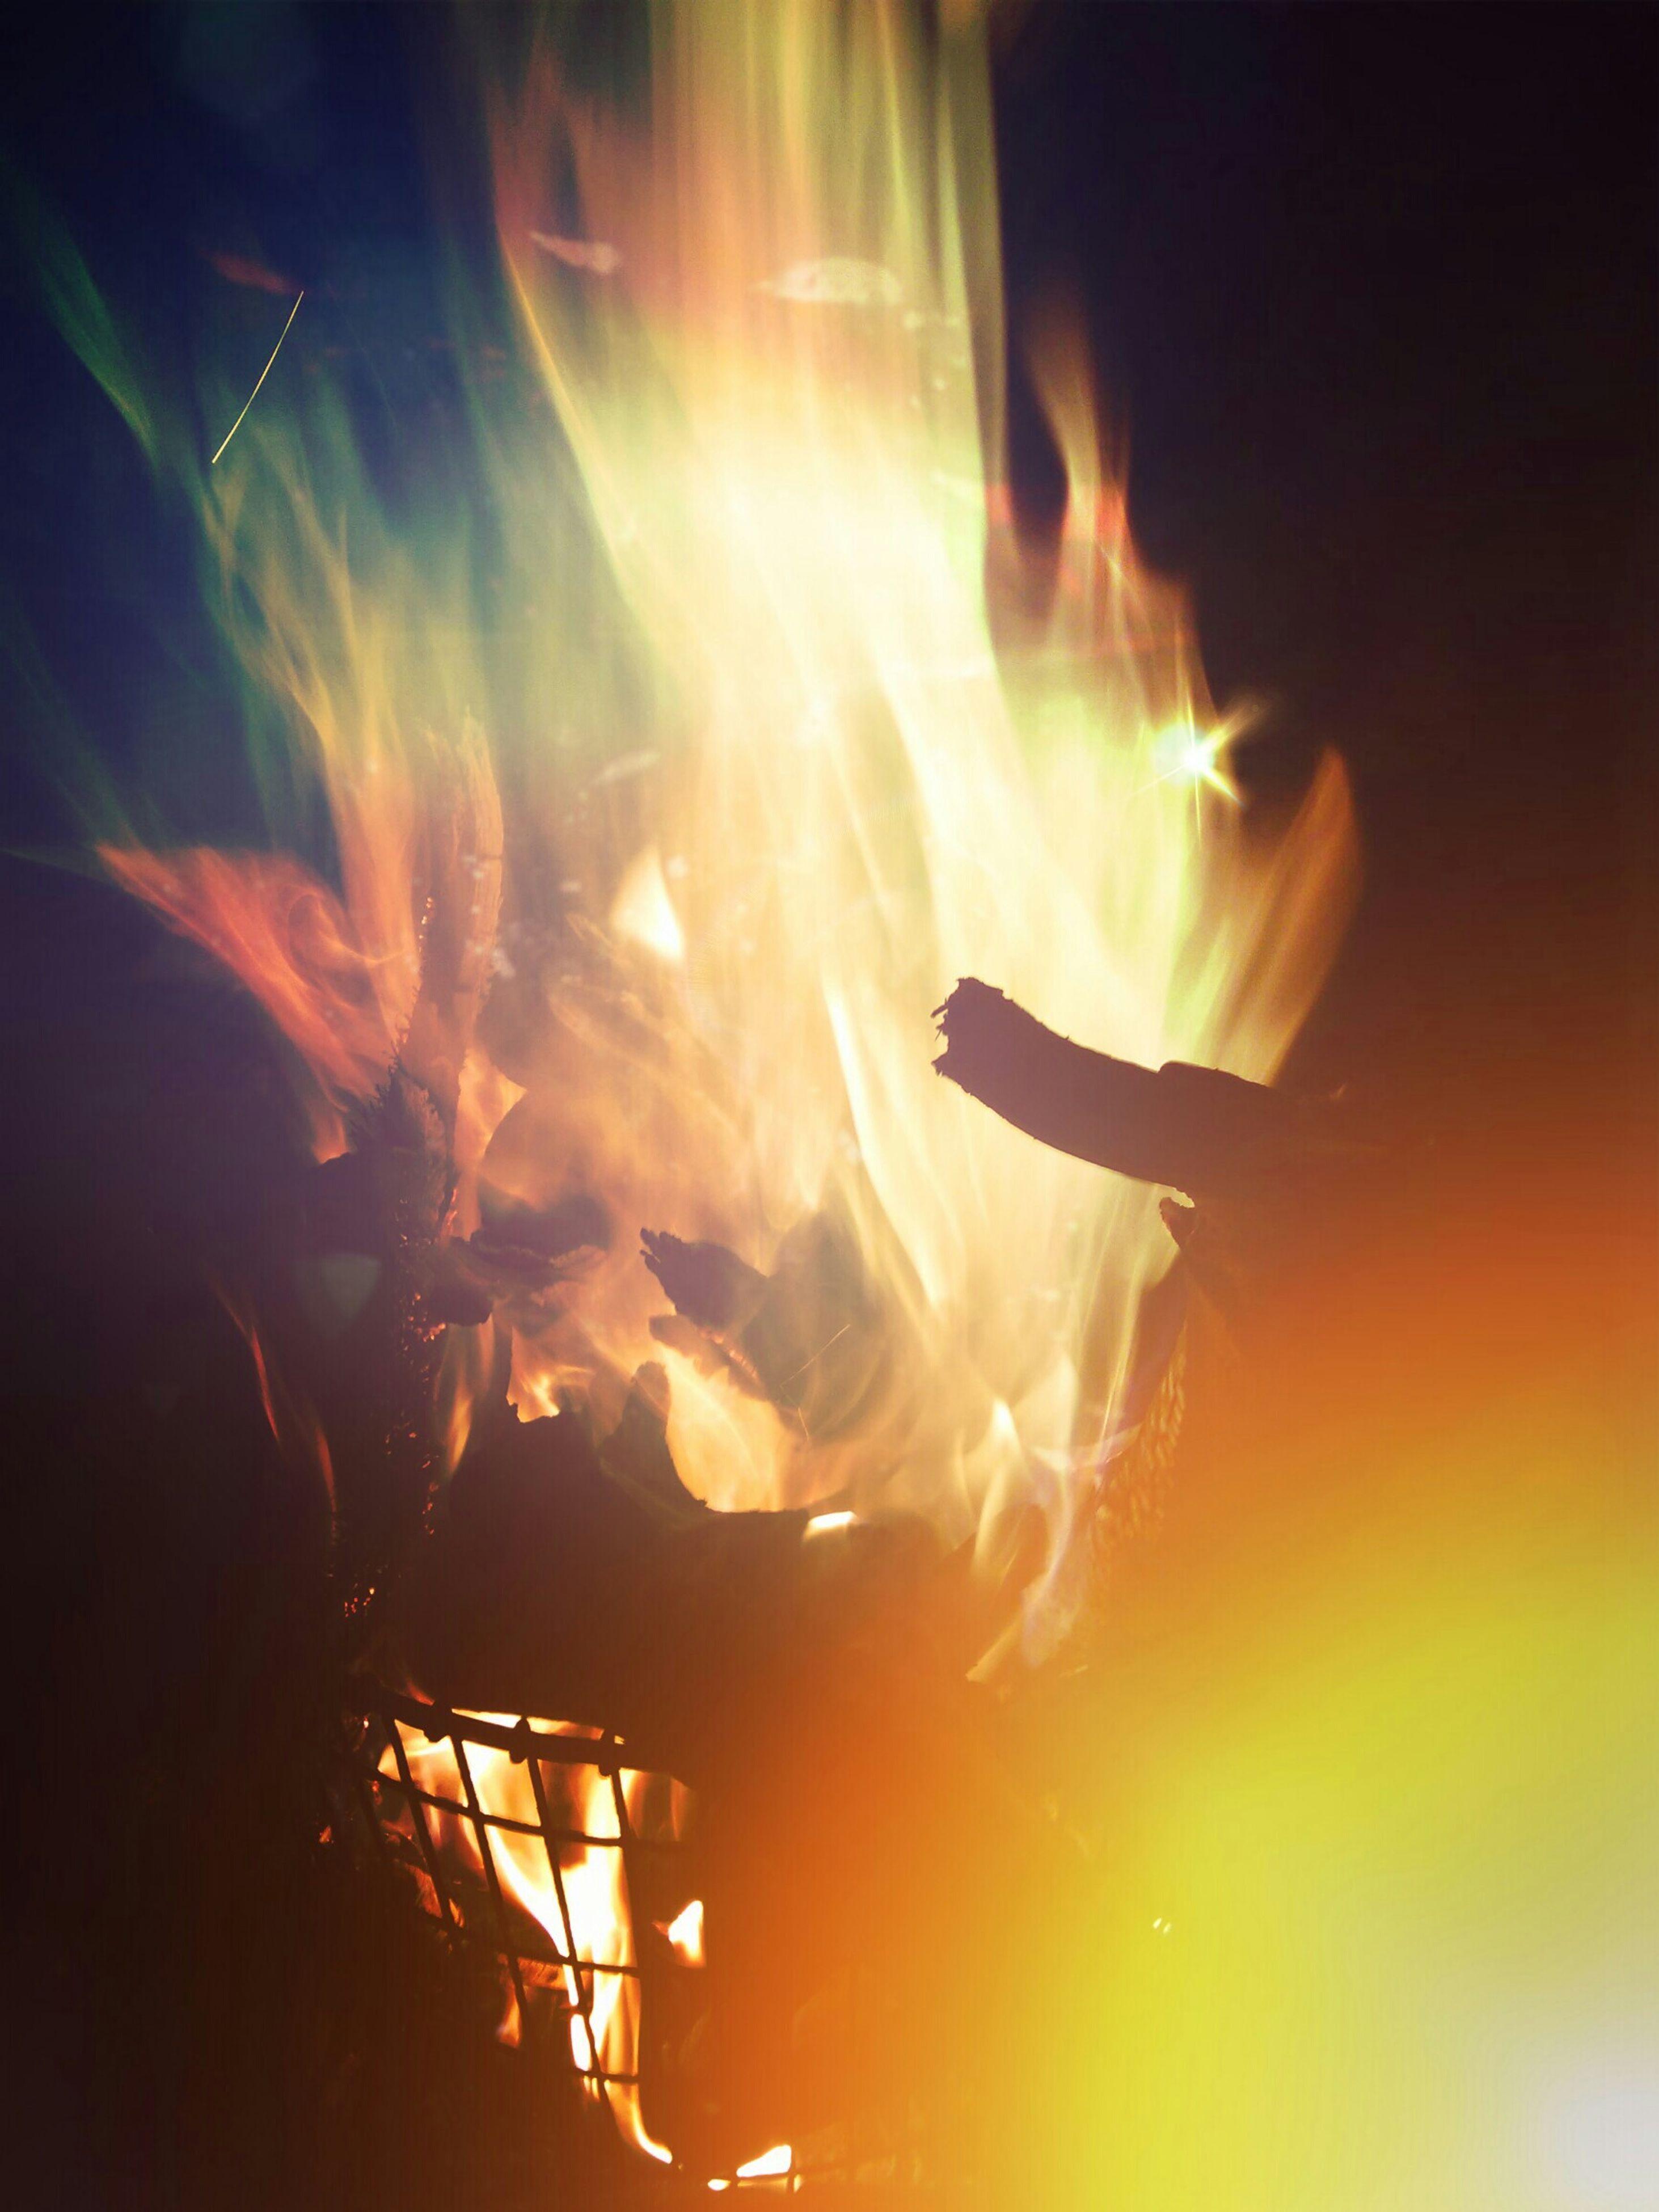 burning, fire - natural phenomenon, flame, heat - temperature, leisure activity, lifestyles, men, orange color, bonfire, glowing, night, fire, motion, silhouette, outdoors, enjoyment, person, light - natural phenomenon